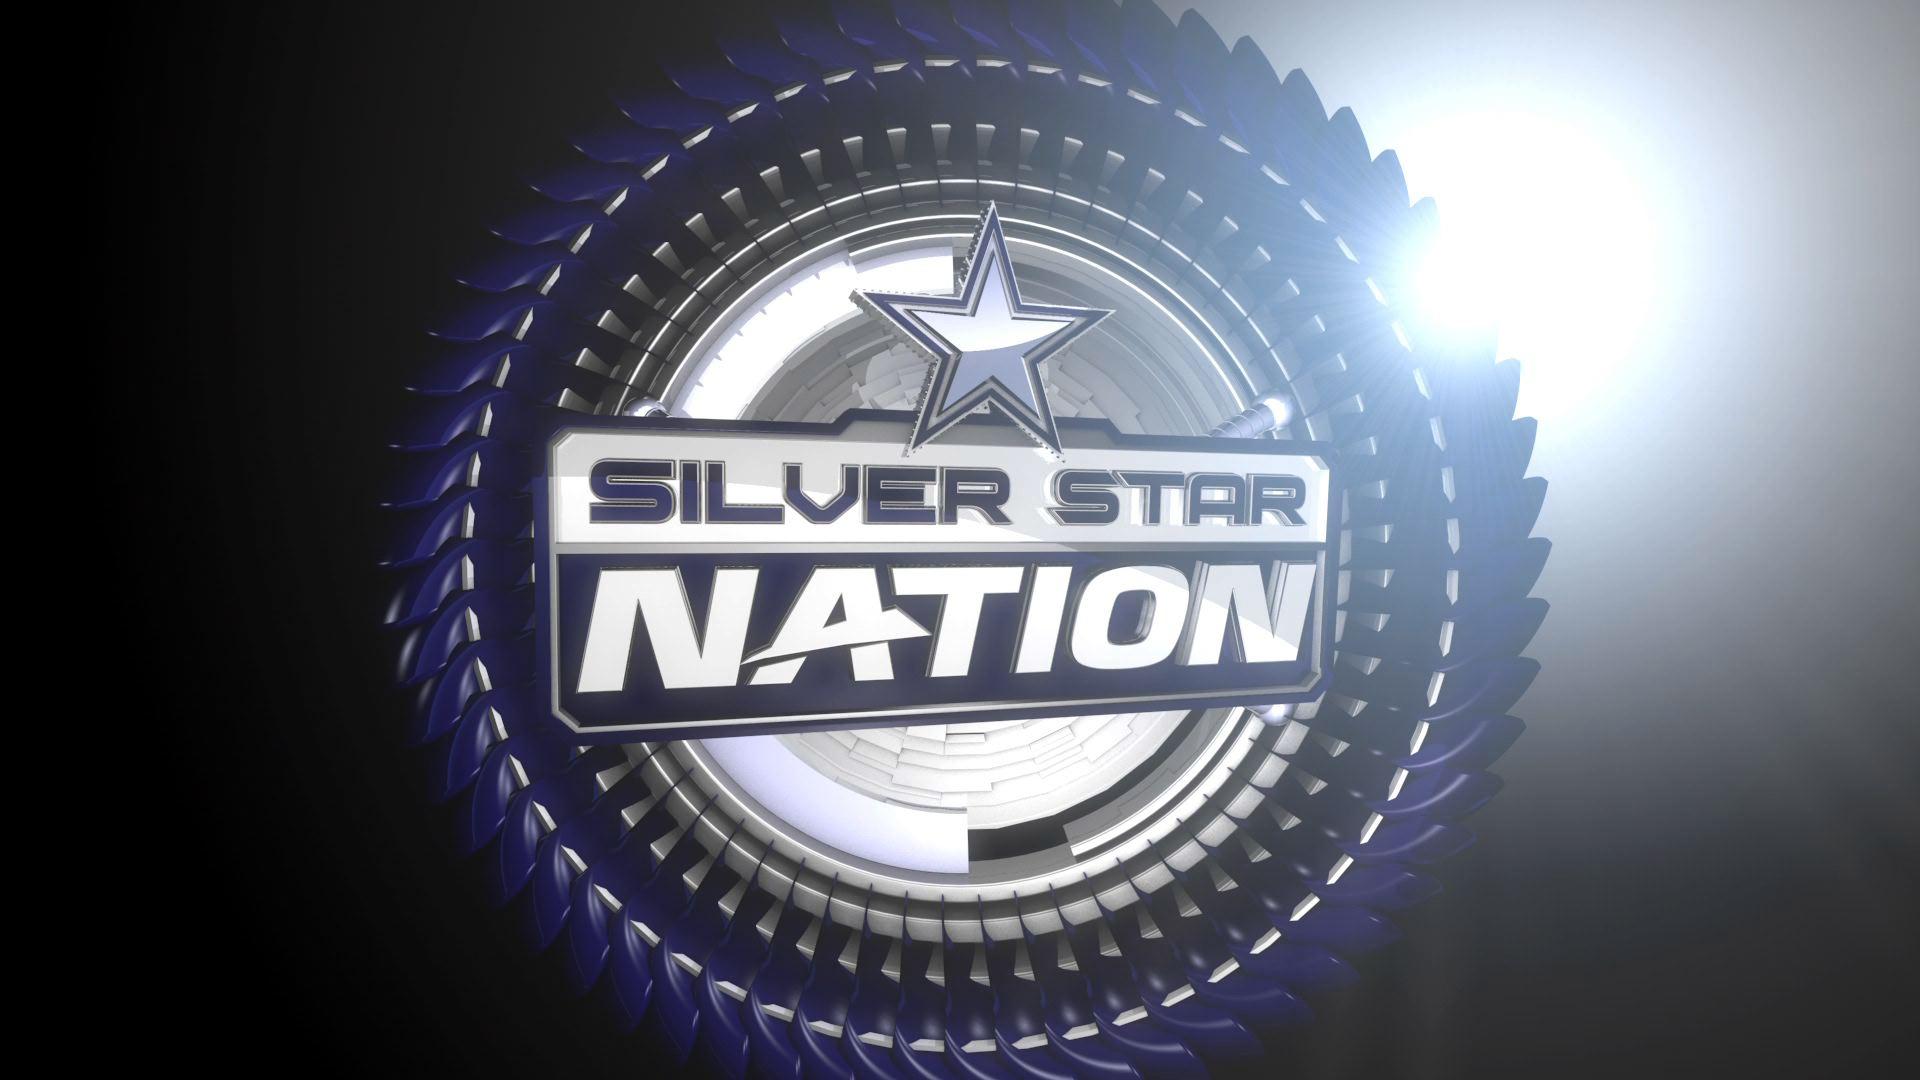 silver star freeze_1508809161163.jpg